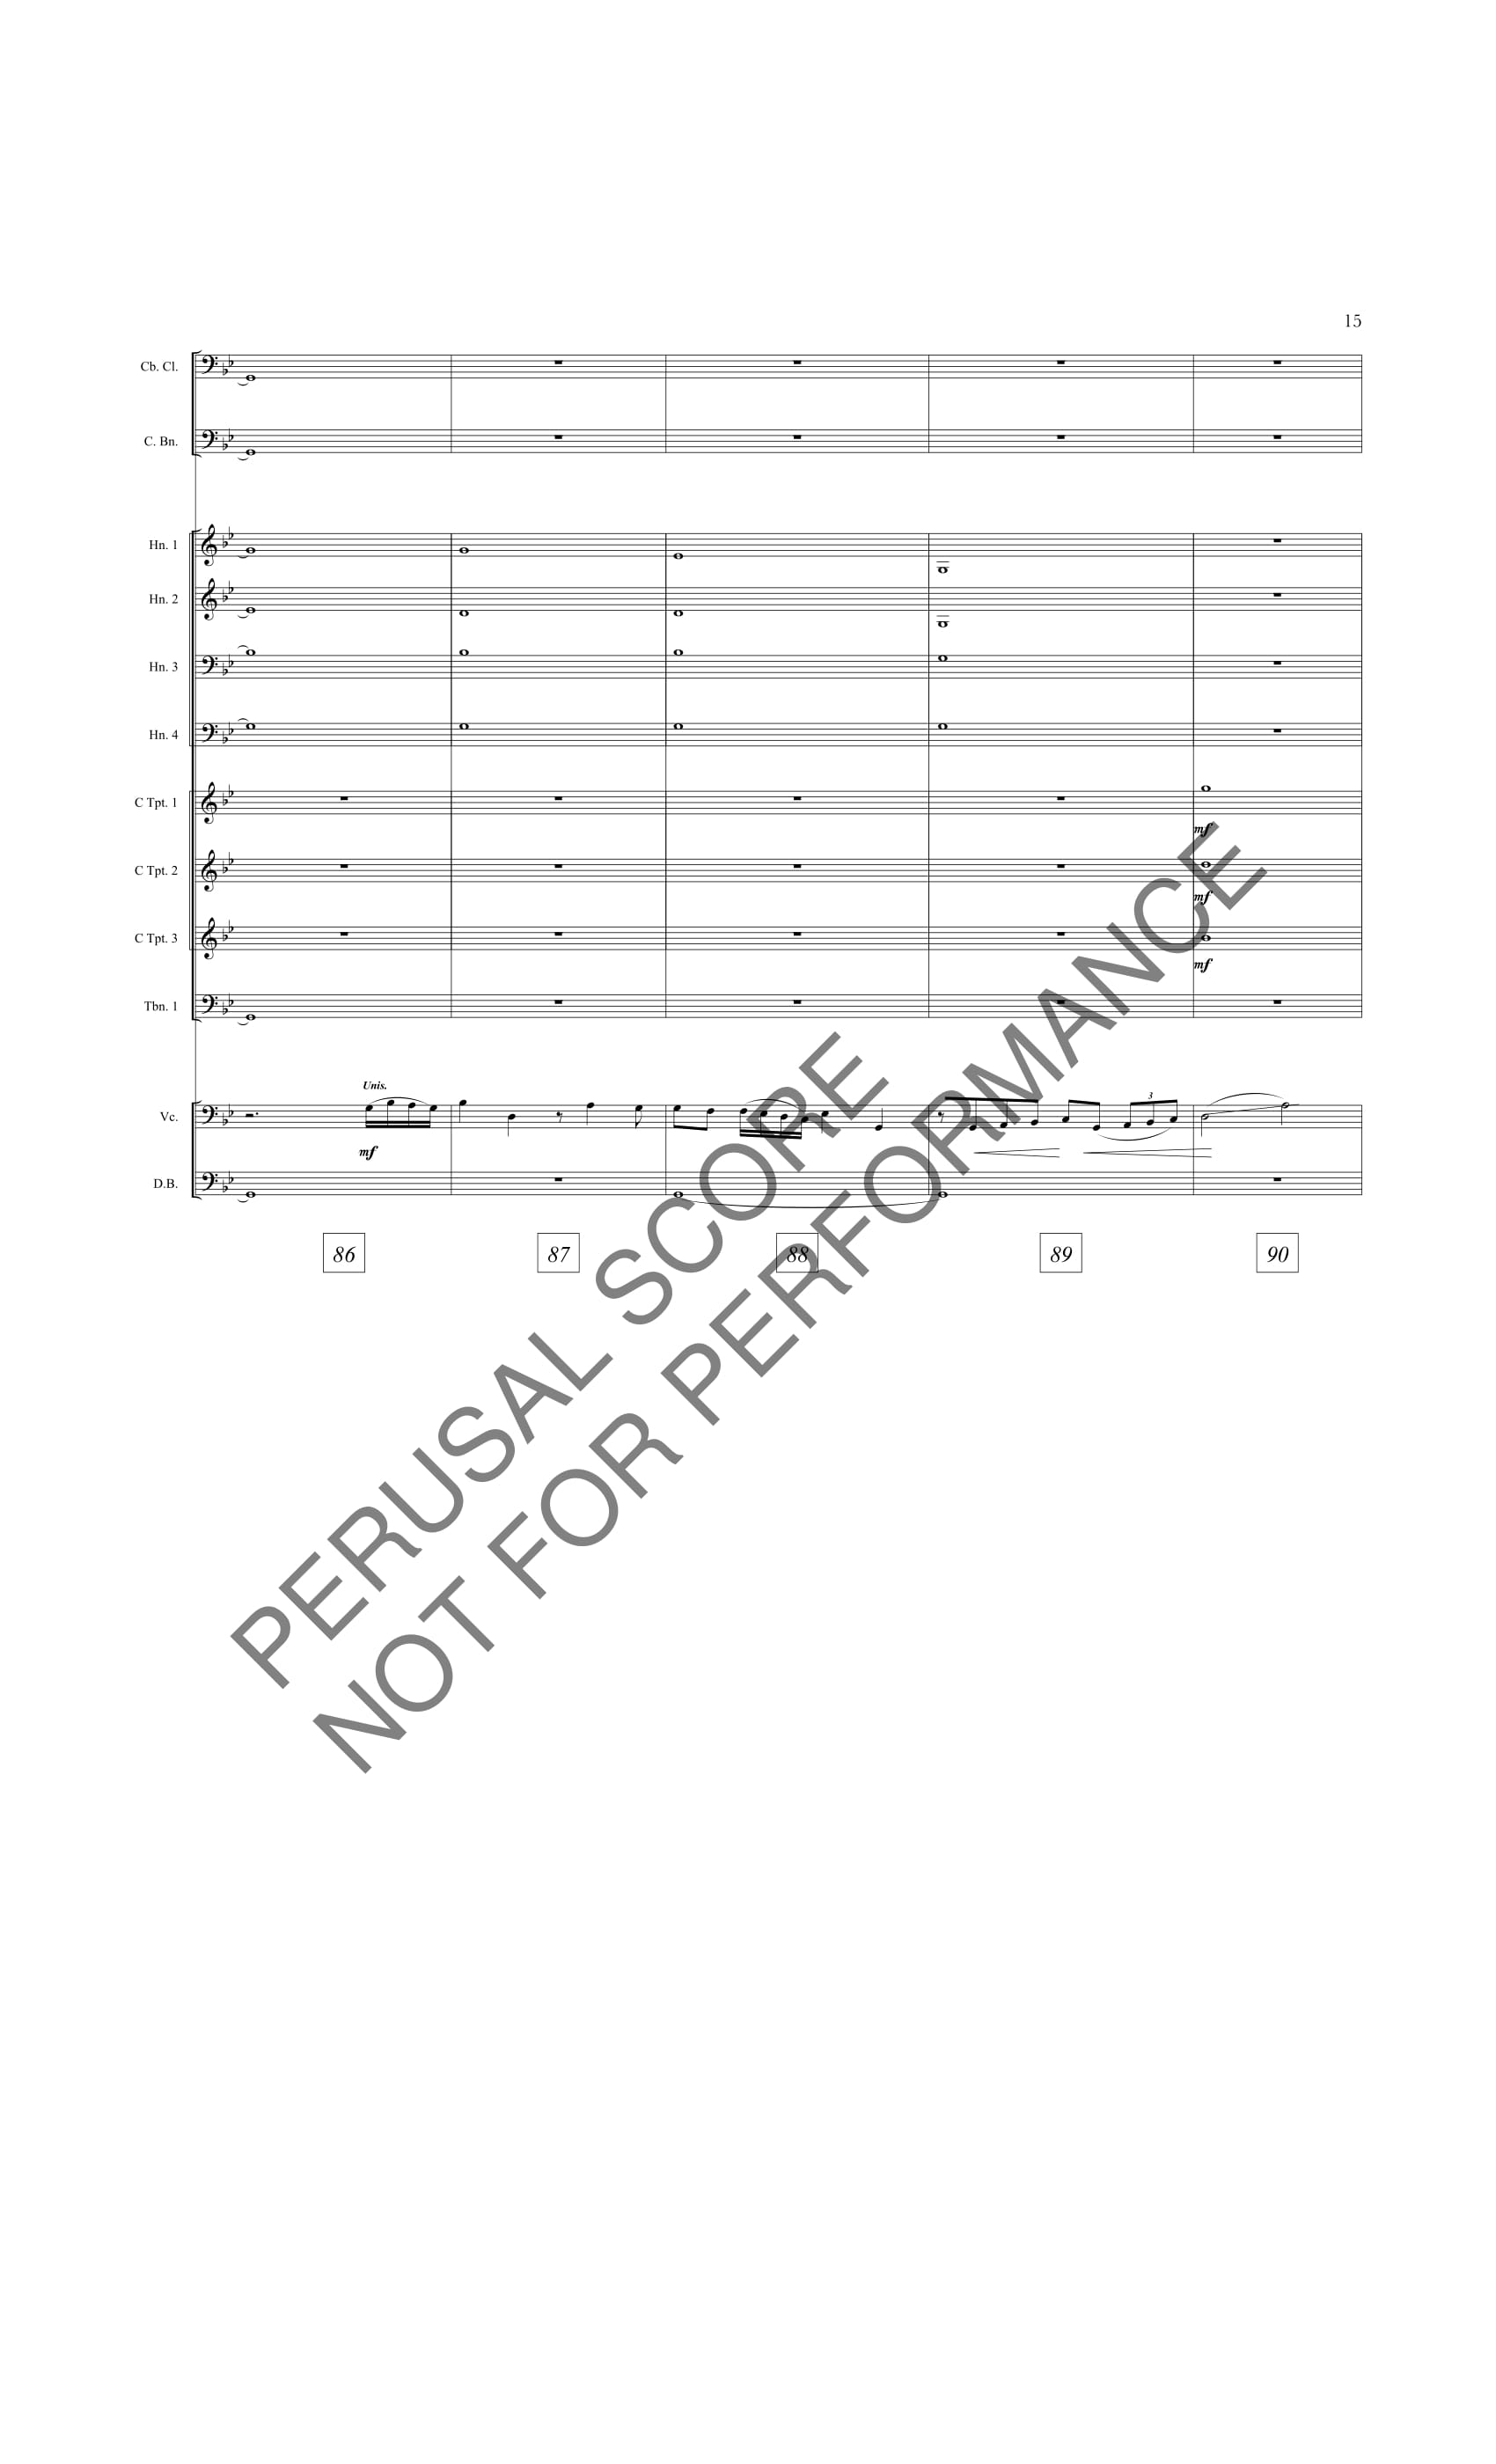 Boyd HouseofFountains Score-watermark-21.jpg